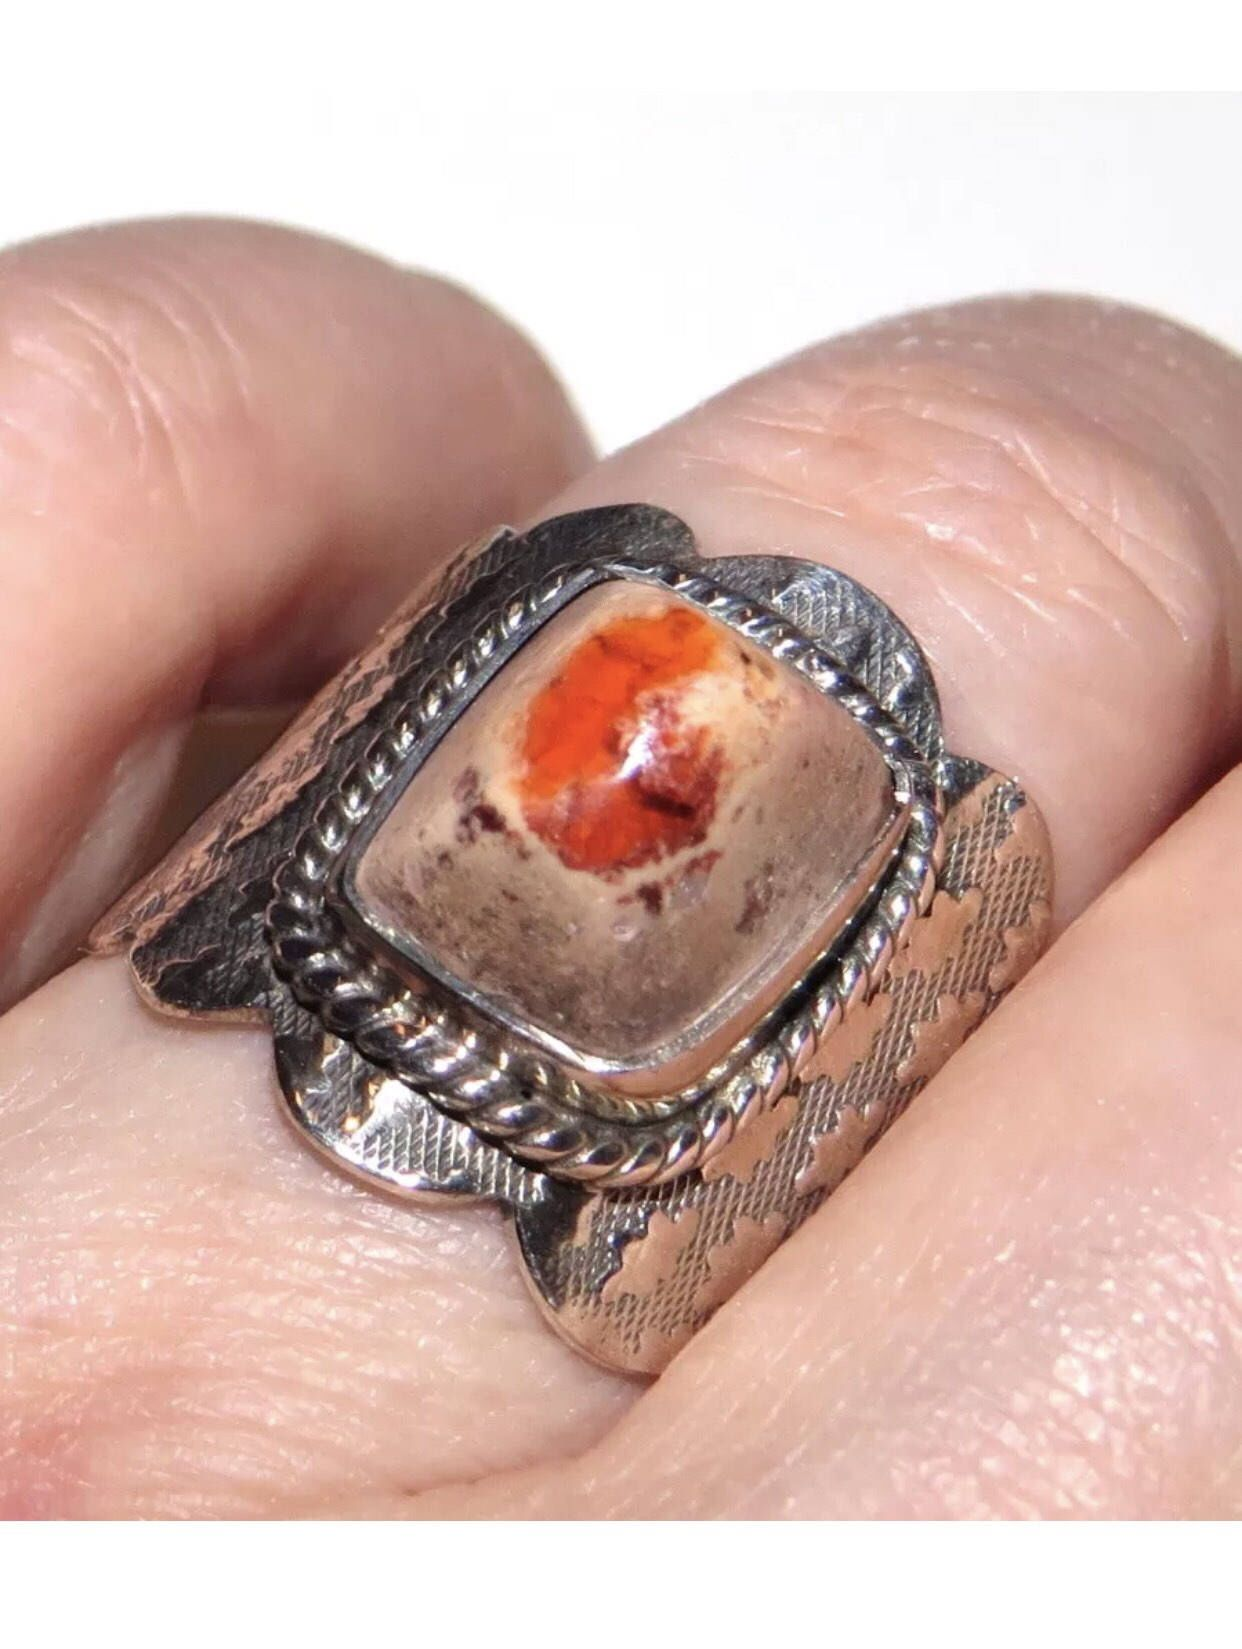 Opal ring , Mexican Fire Opal Ring , Fire Opal ,Beautiful